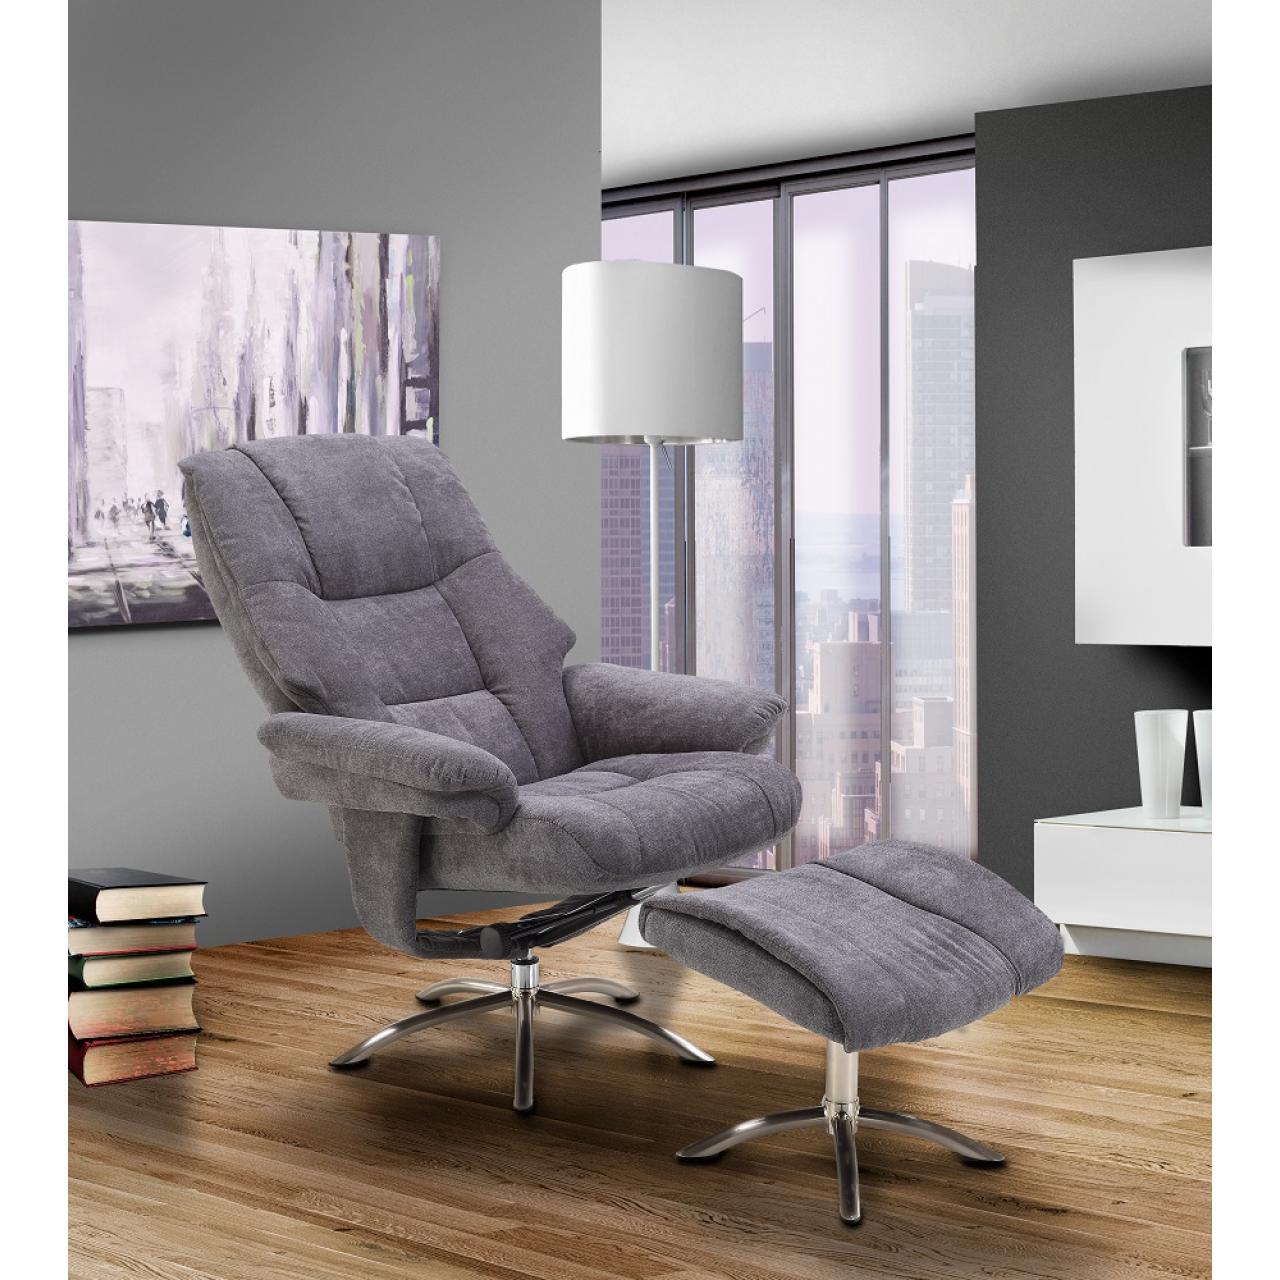 Relaxsessel FM-440 grau drehbar inklusive Hocker Fernsehsessel Kinosessel